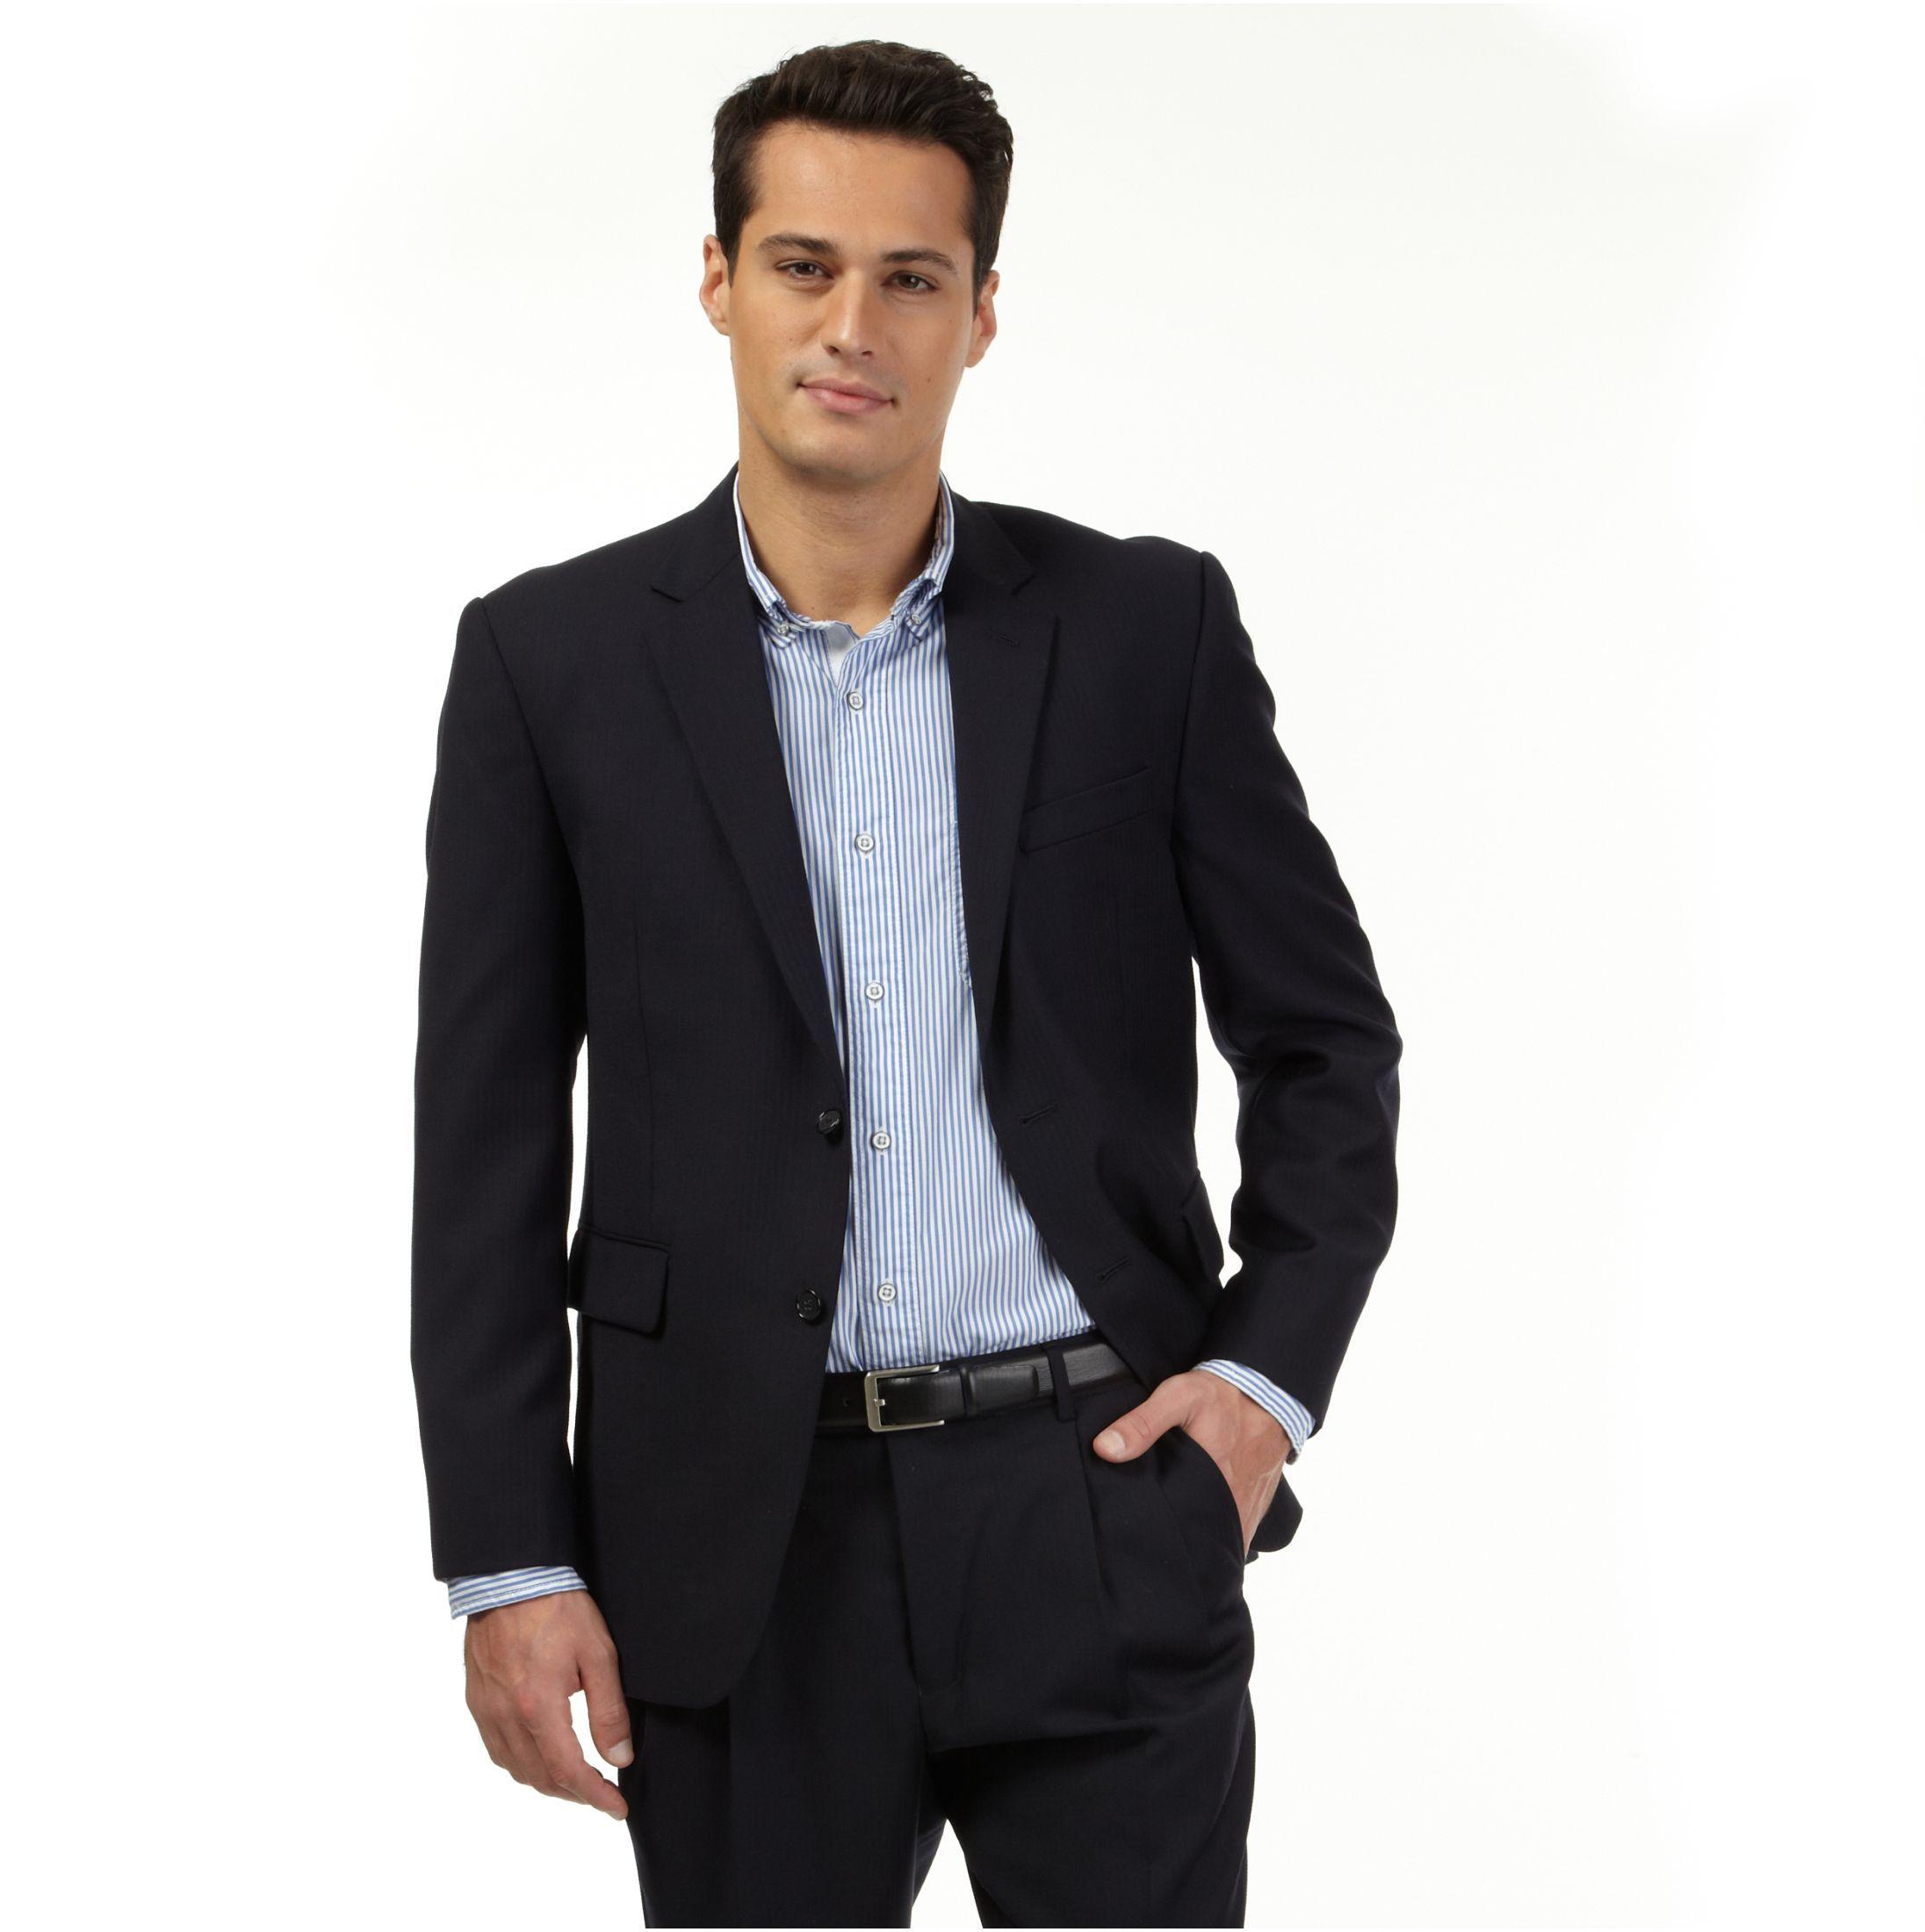 Suit jacket - Herringbone Suit Jacket